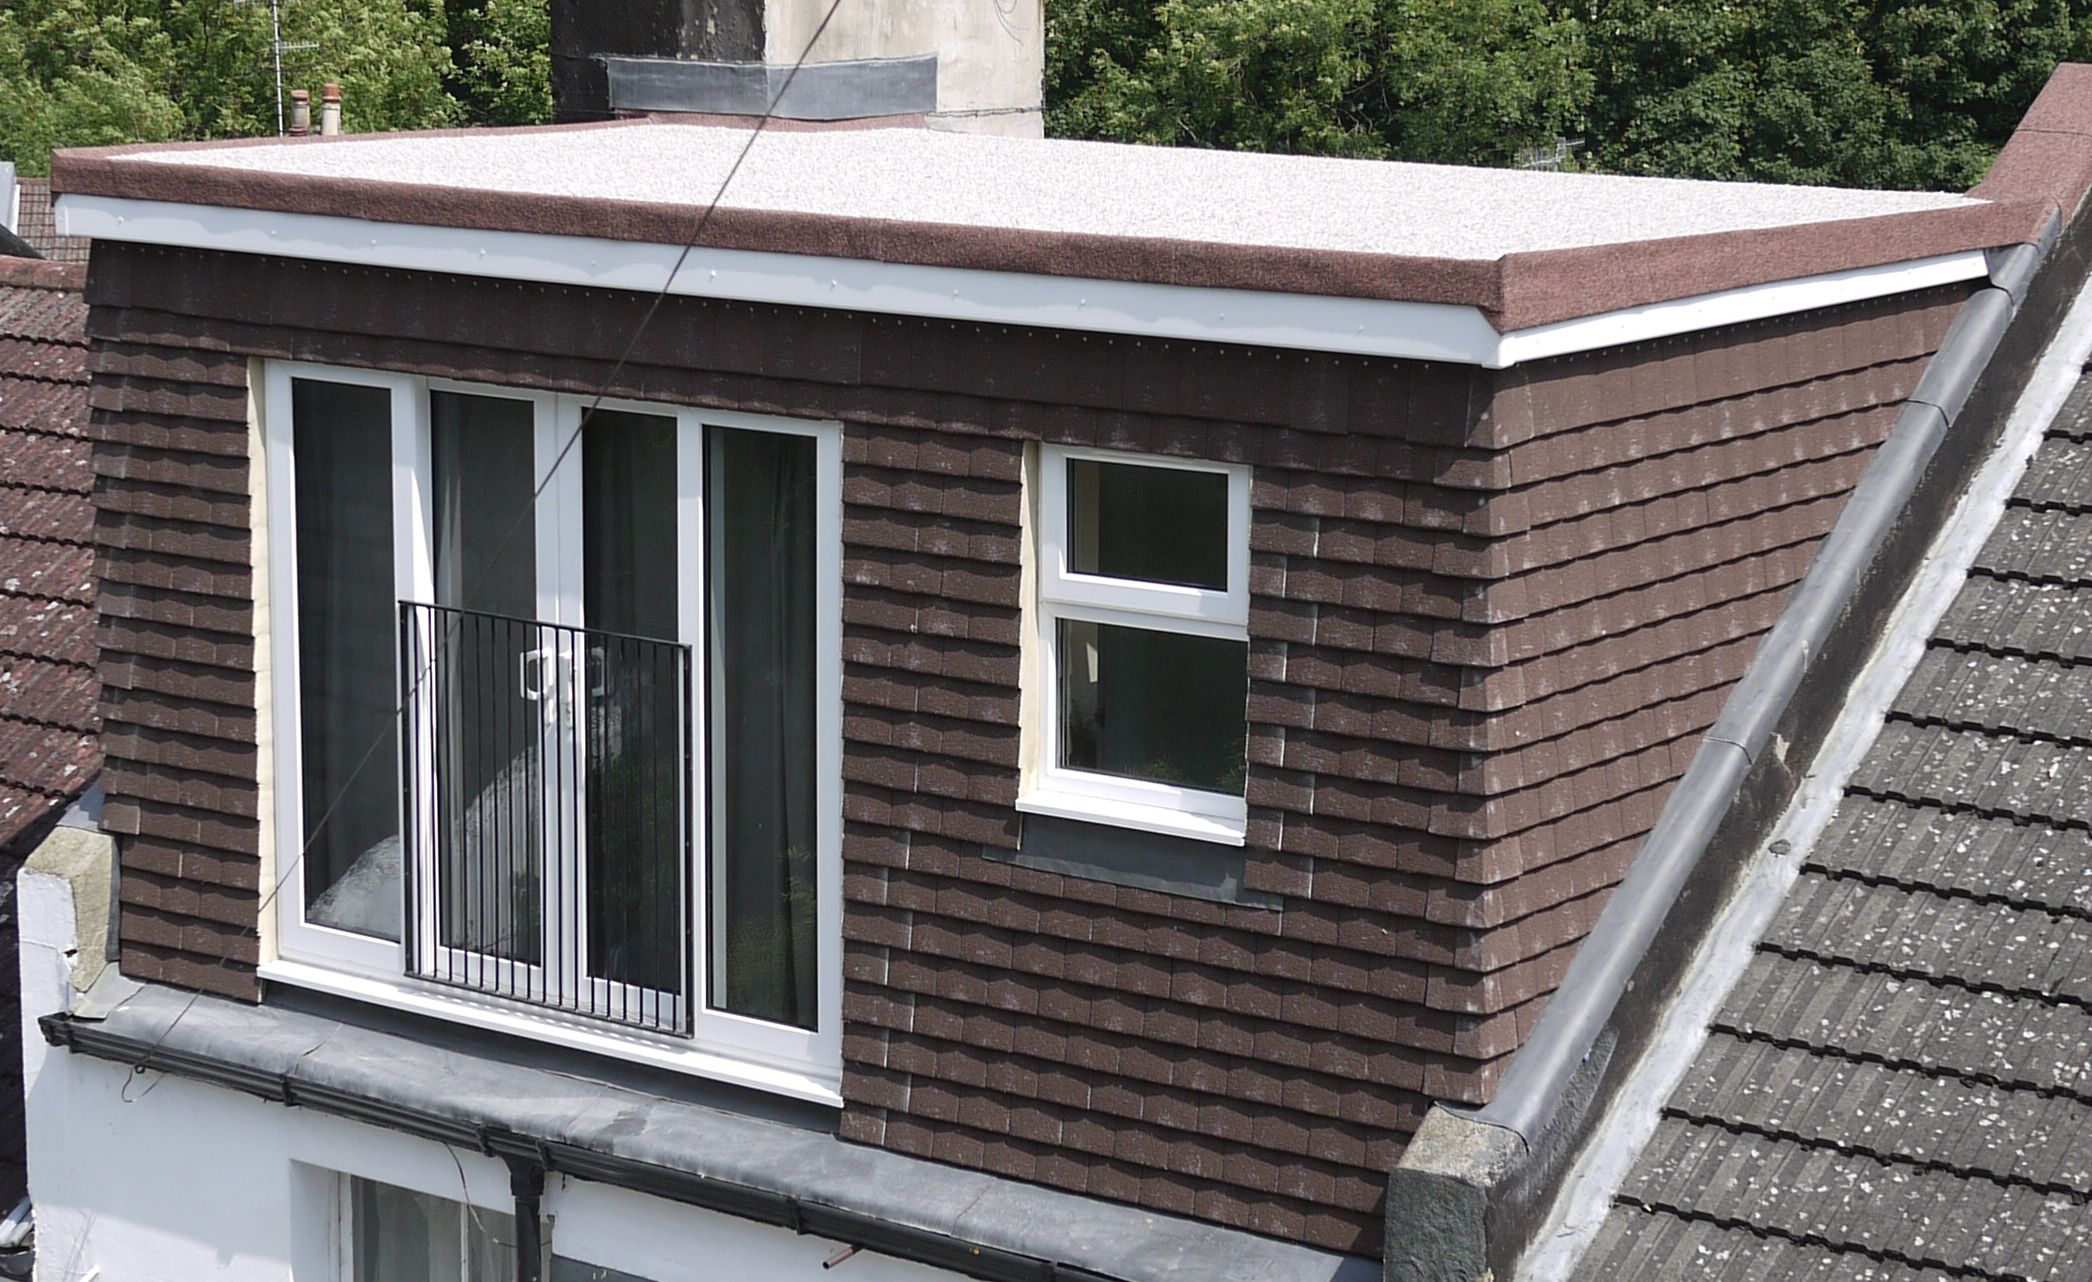 Building a dormer on a house - Posts About Terrace House Dormer Loft Conversion On Jackson Loft Conversions Brighton